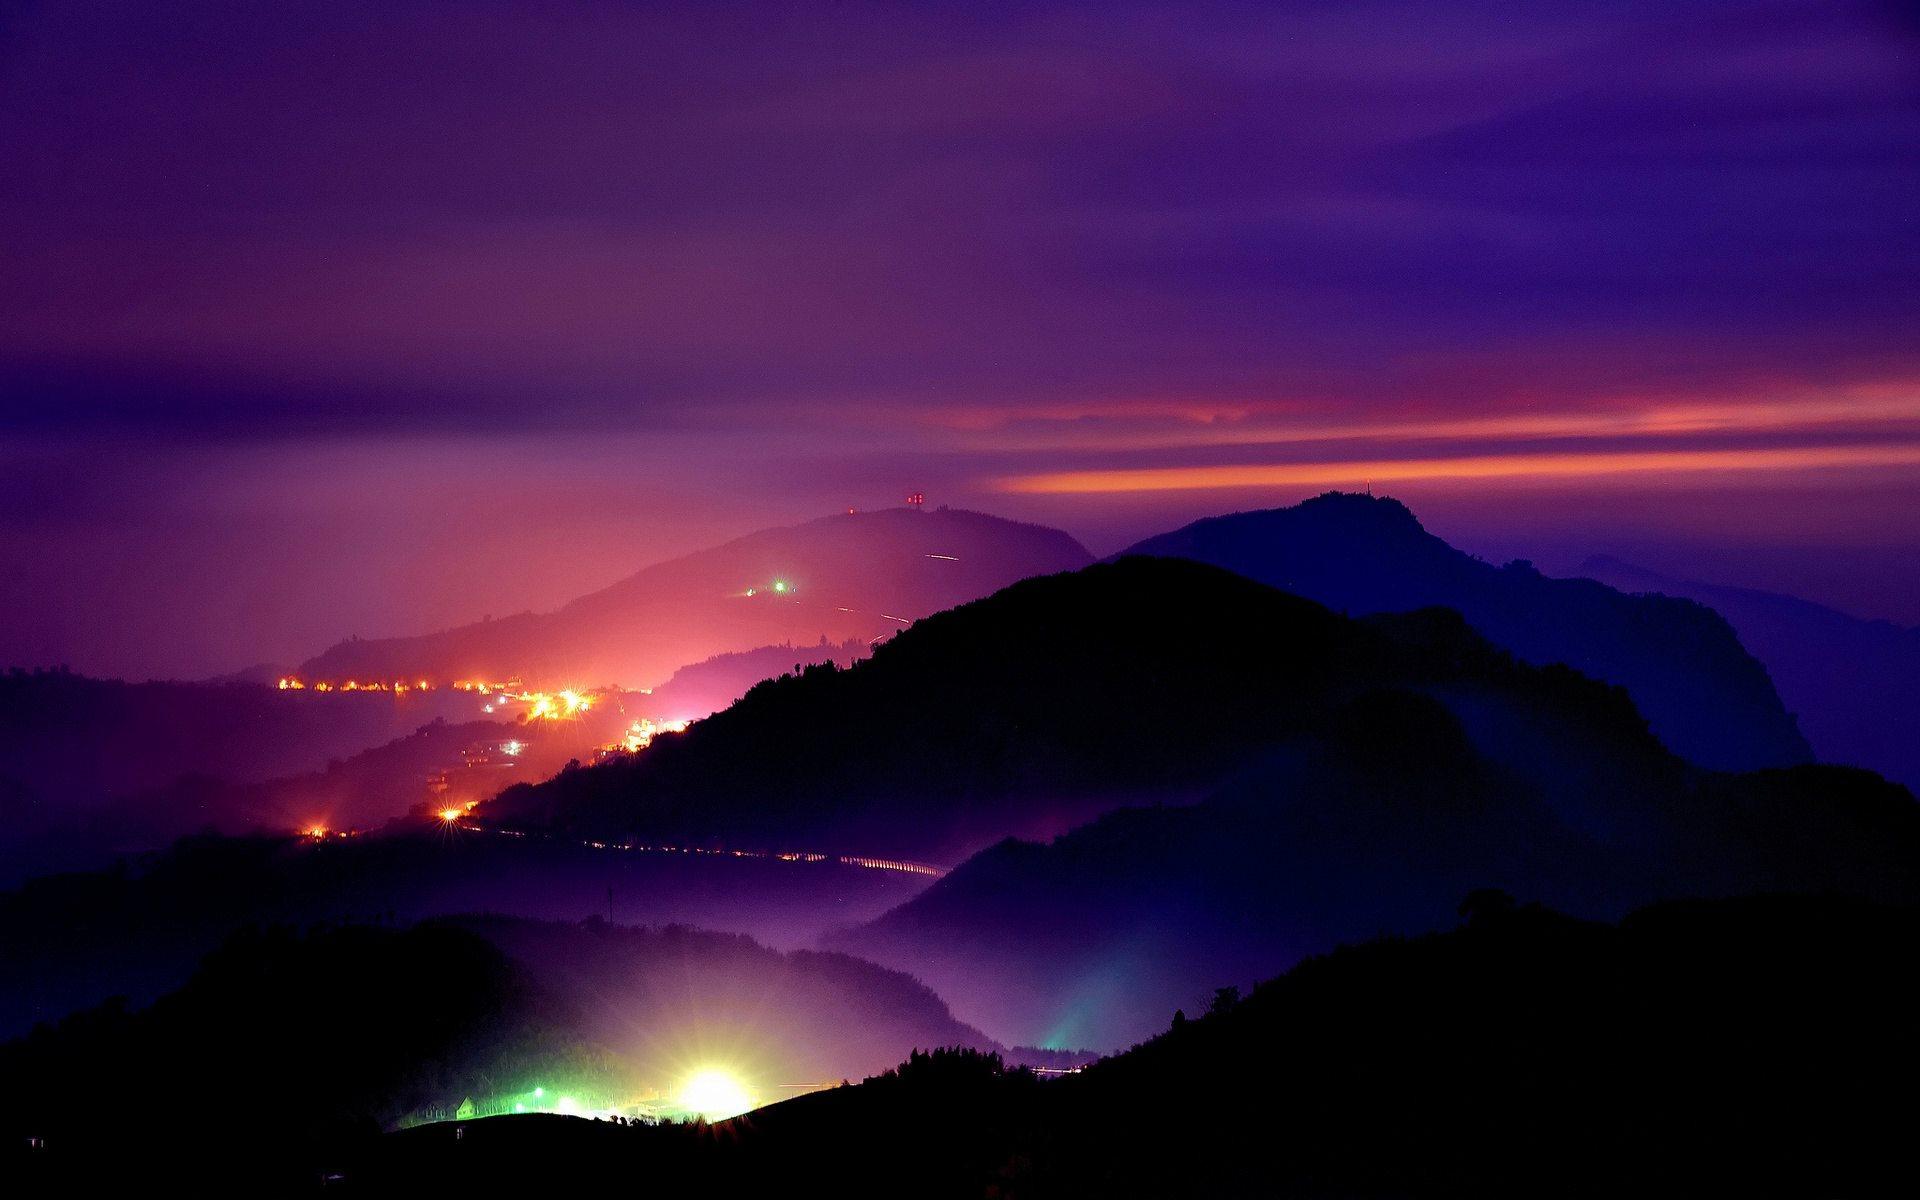 Mountains at Night Widescreen HD Desktop Backgrounds Photos 1920x1200